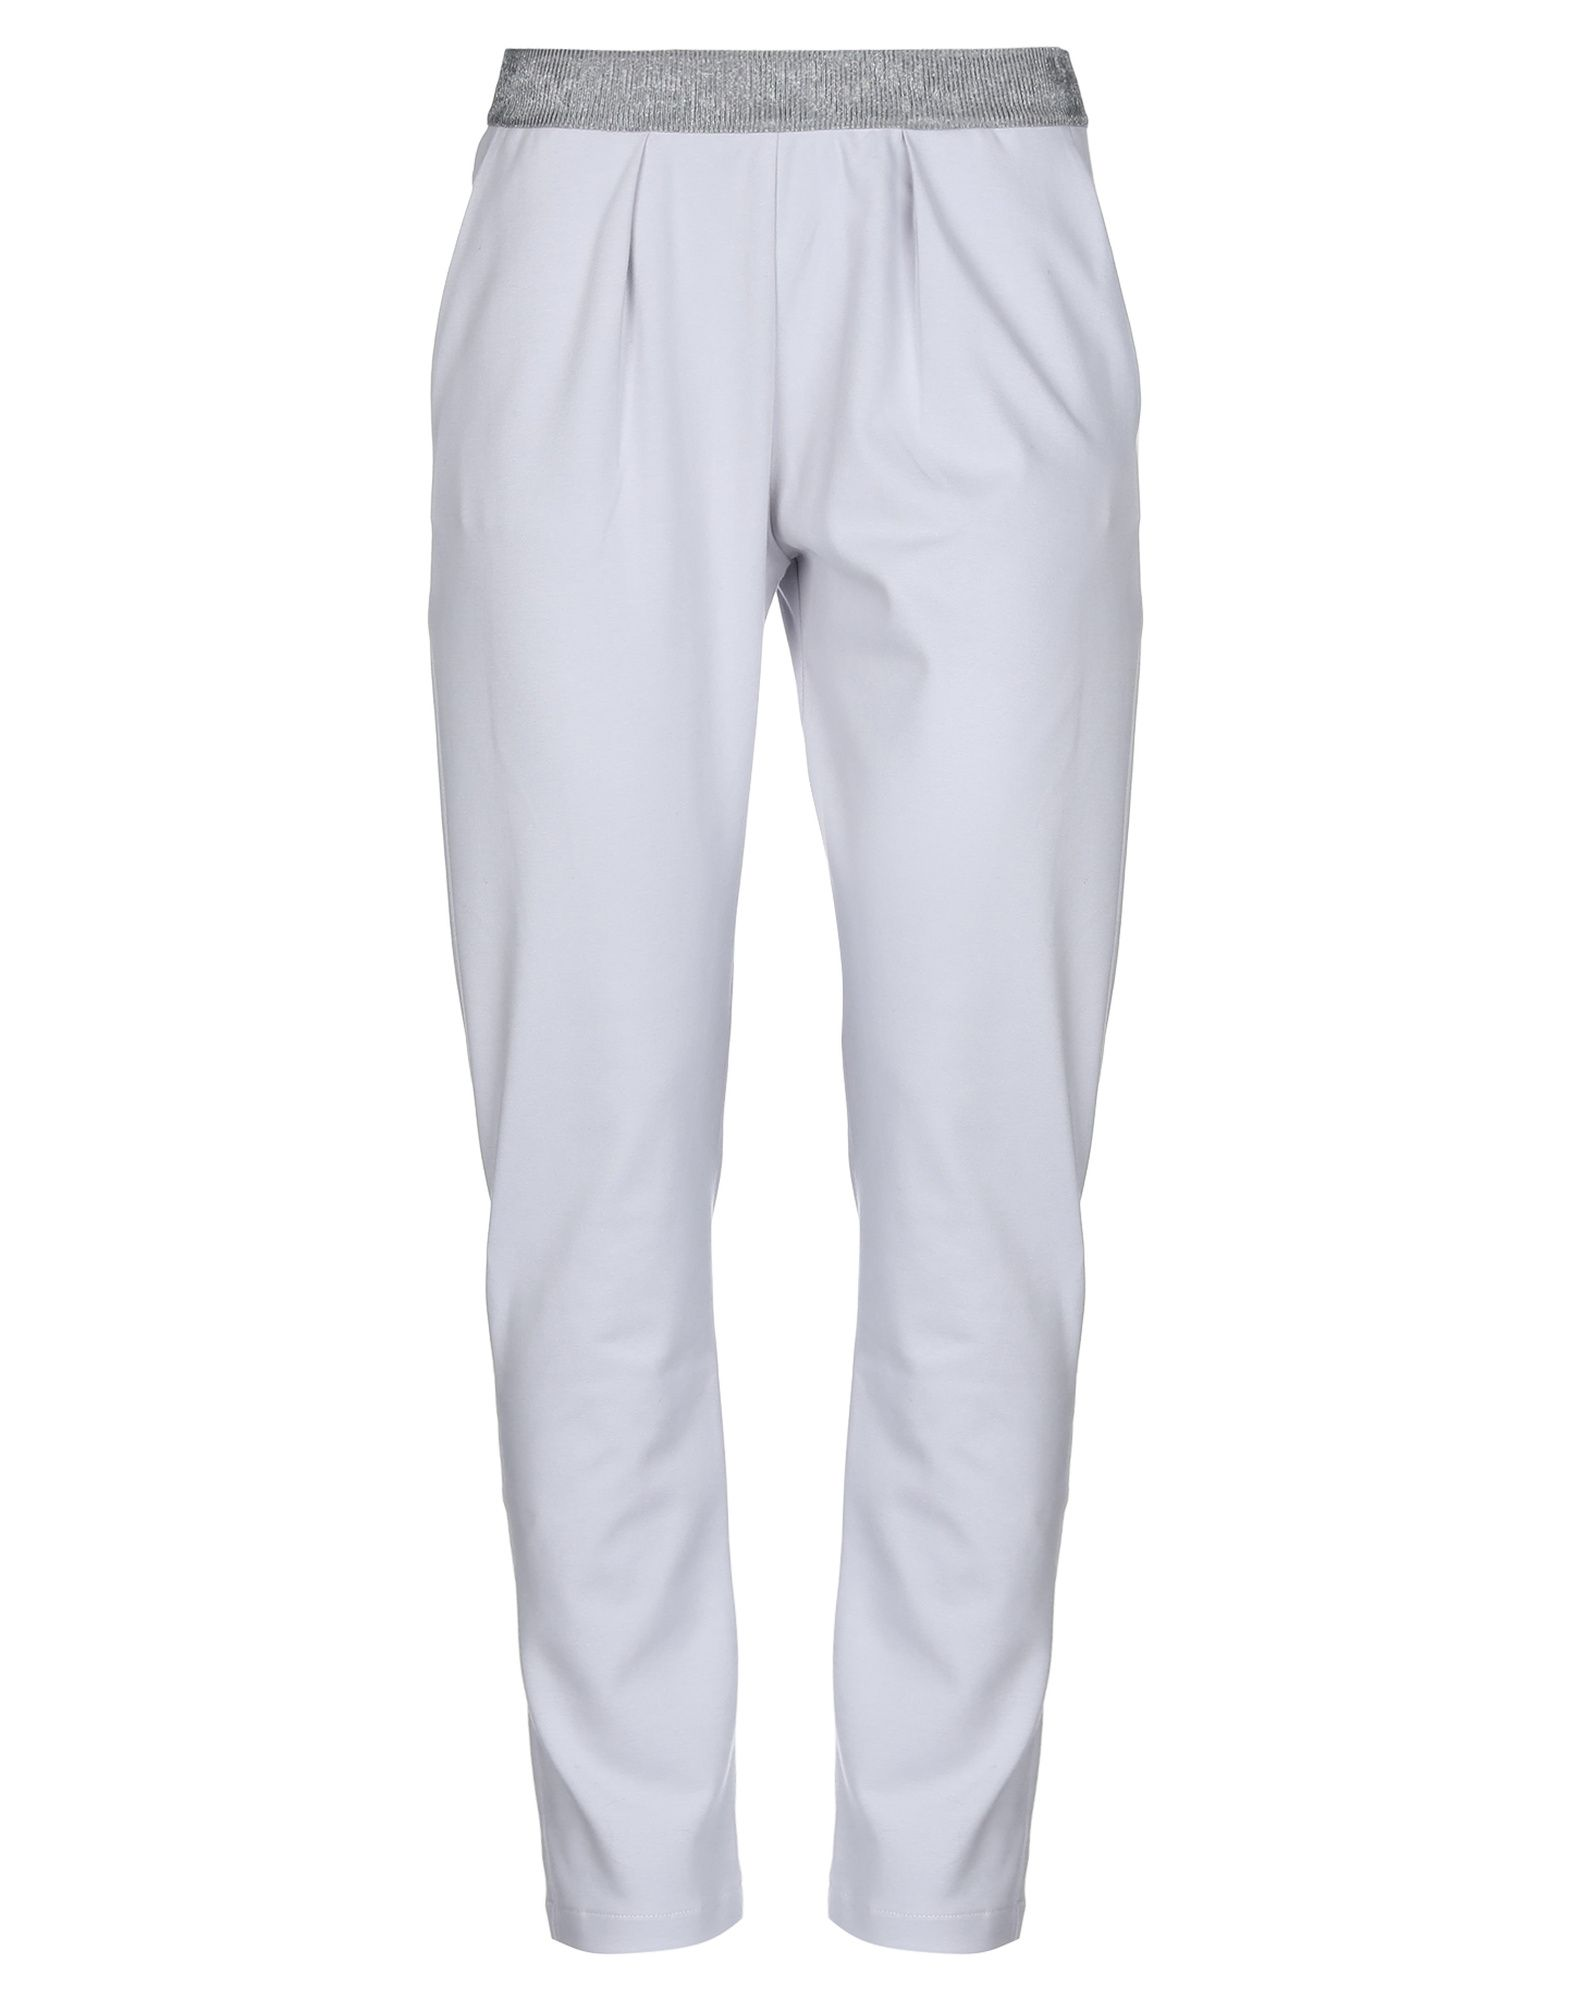 FOTI - LA BIELLESE Повседневные брюки manifatture alto biellese 1947 шарф